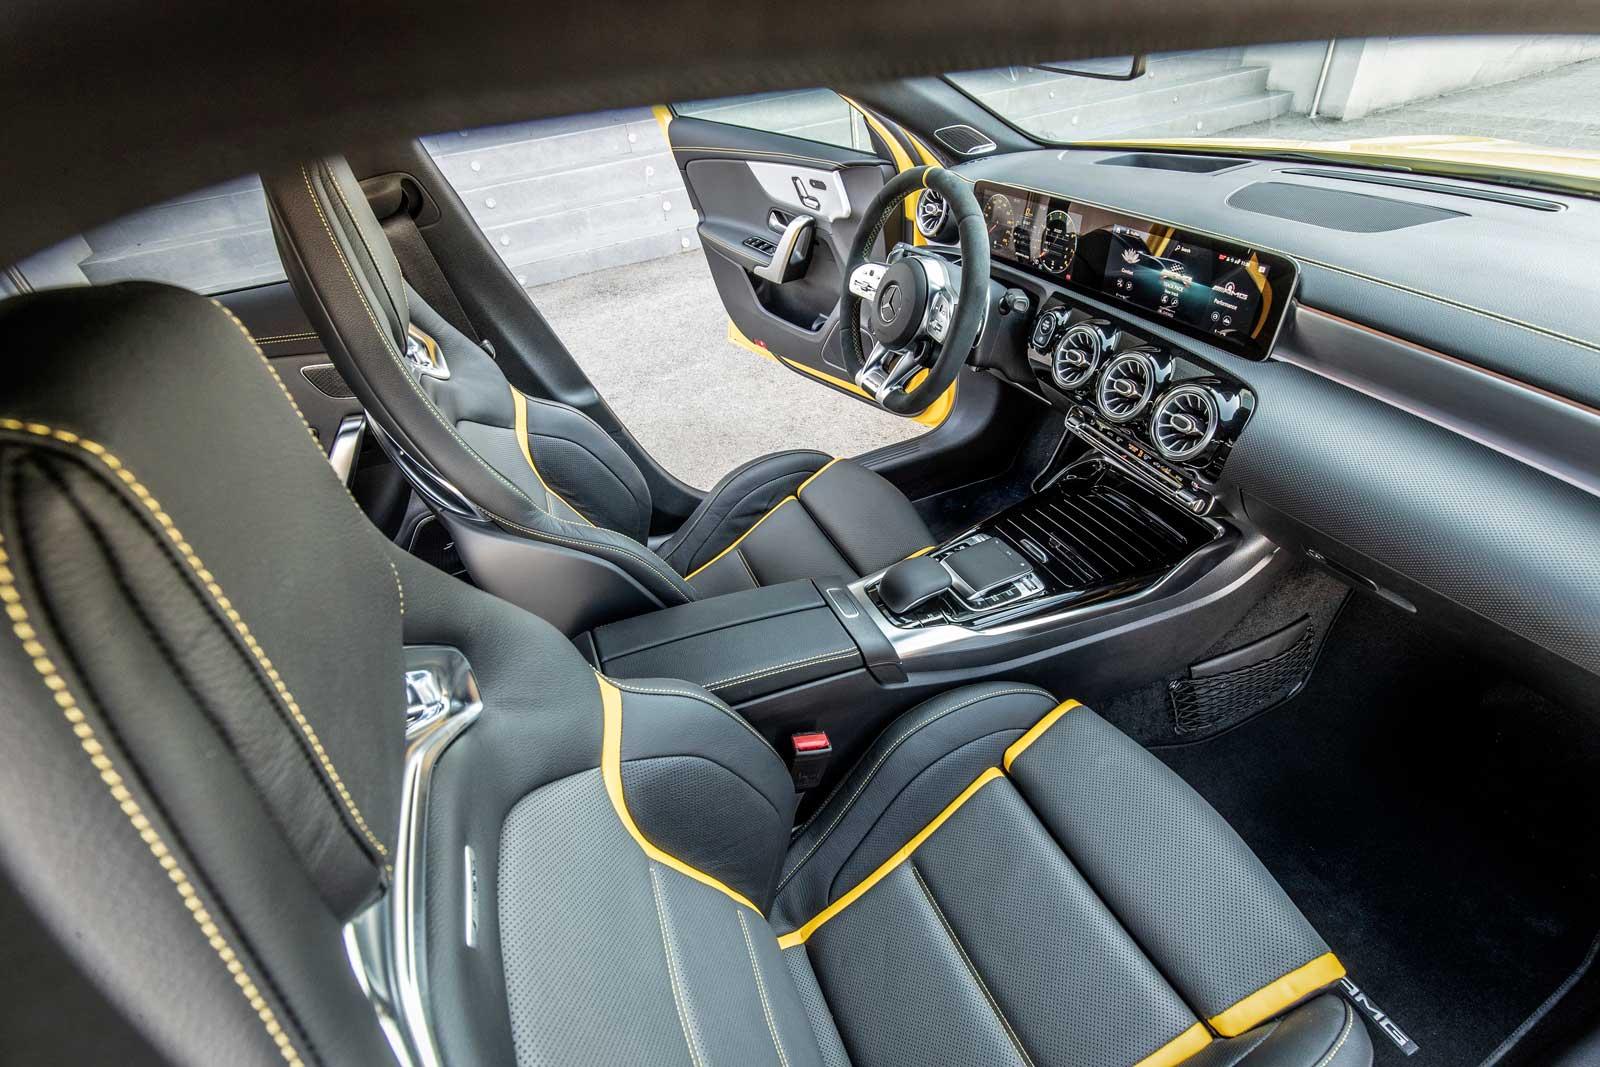 Mercedes A 45S AMG